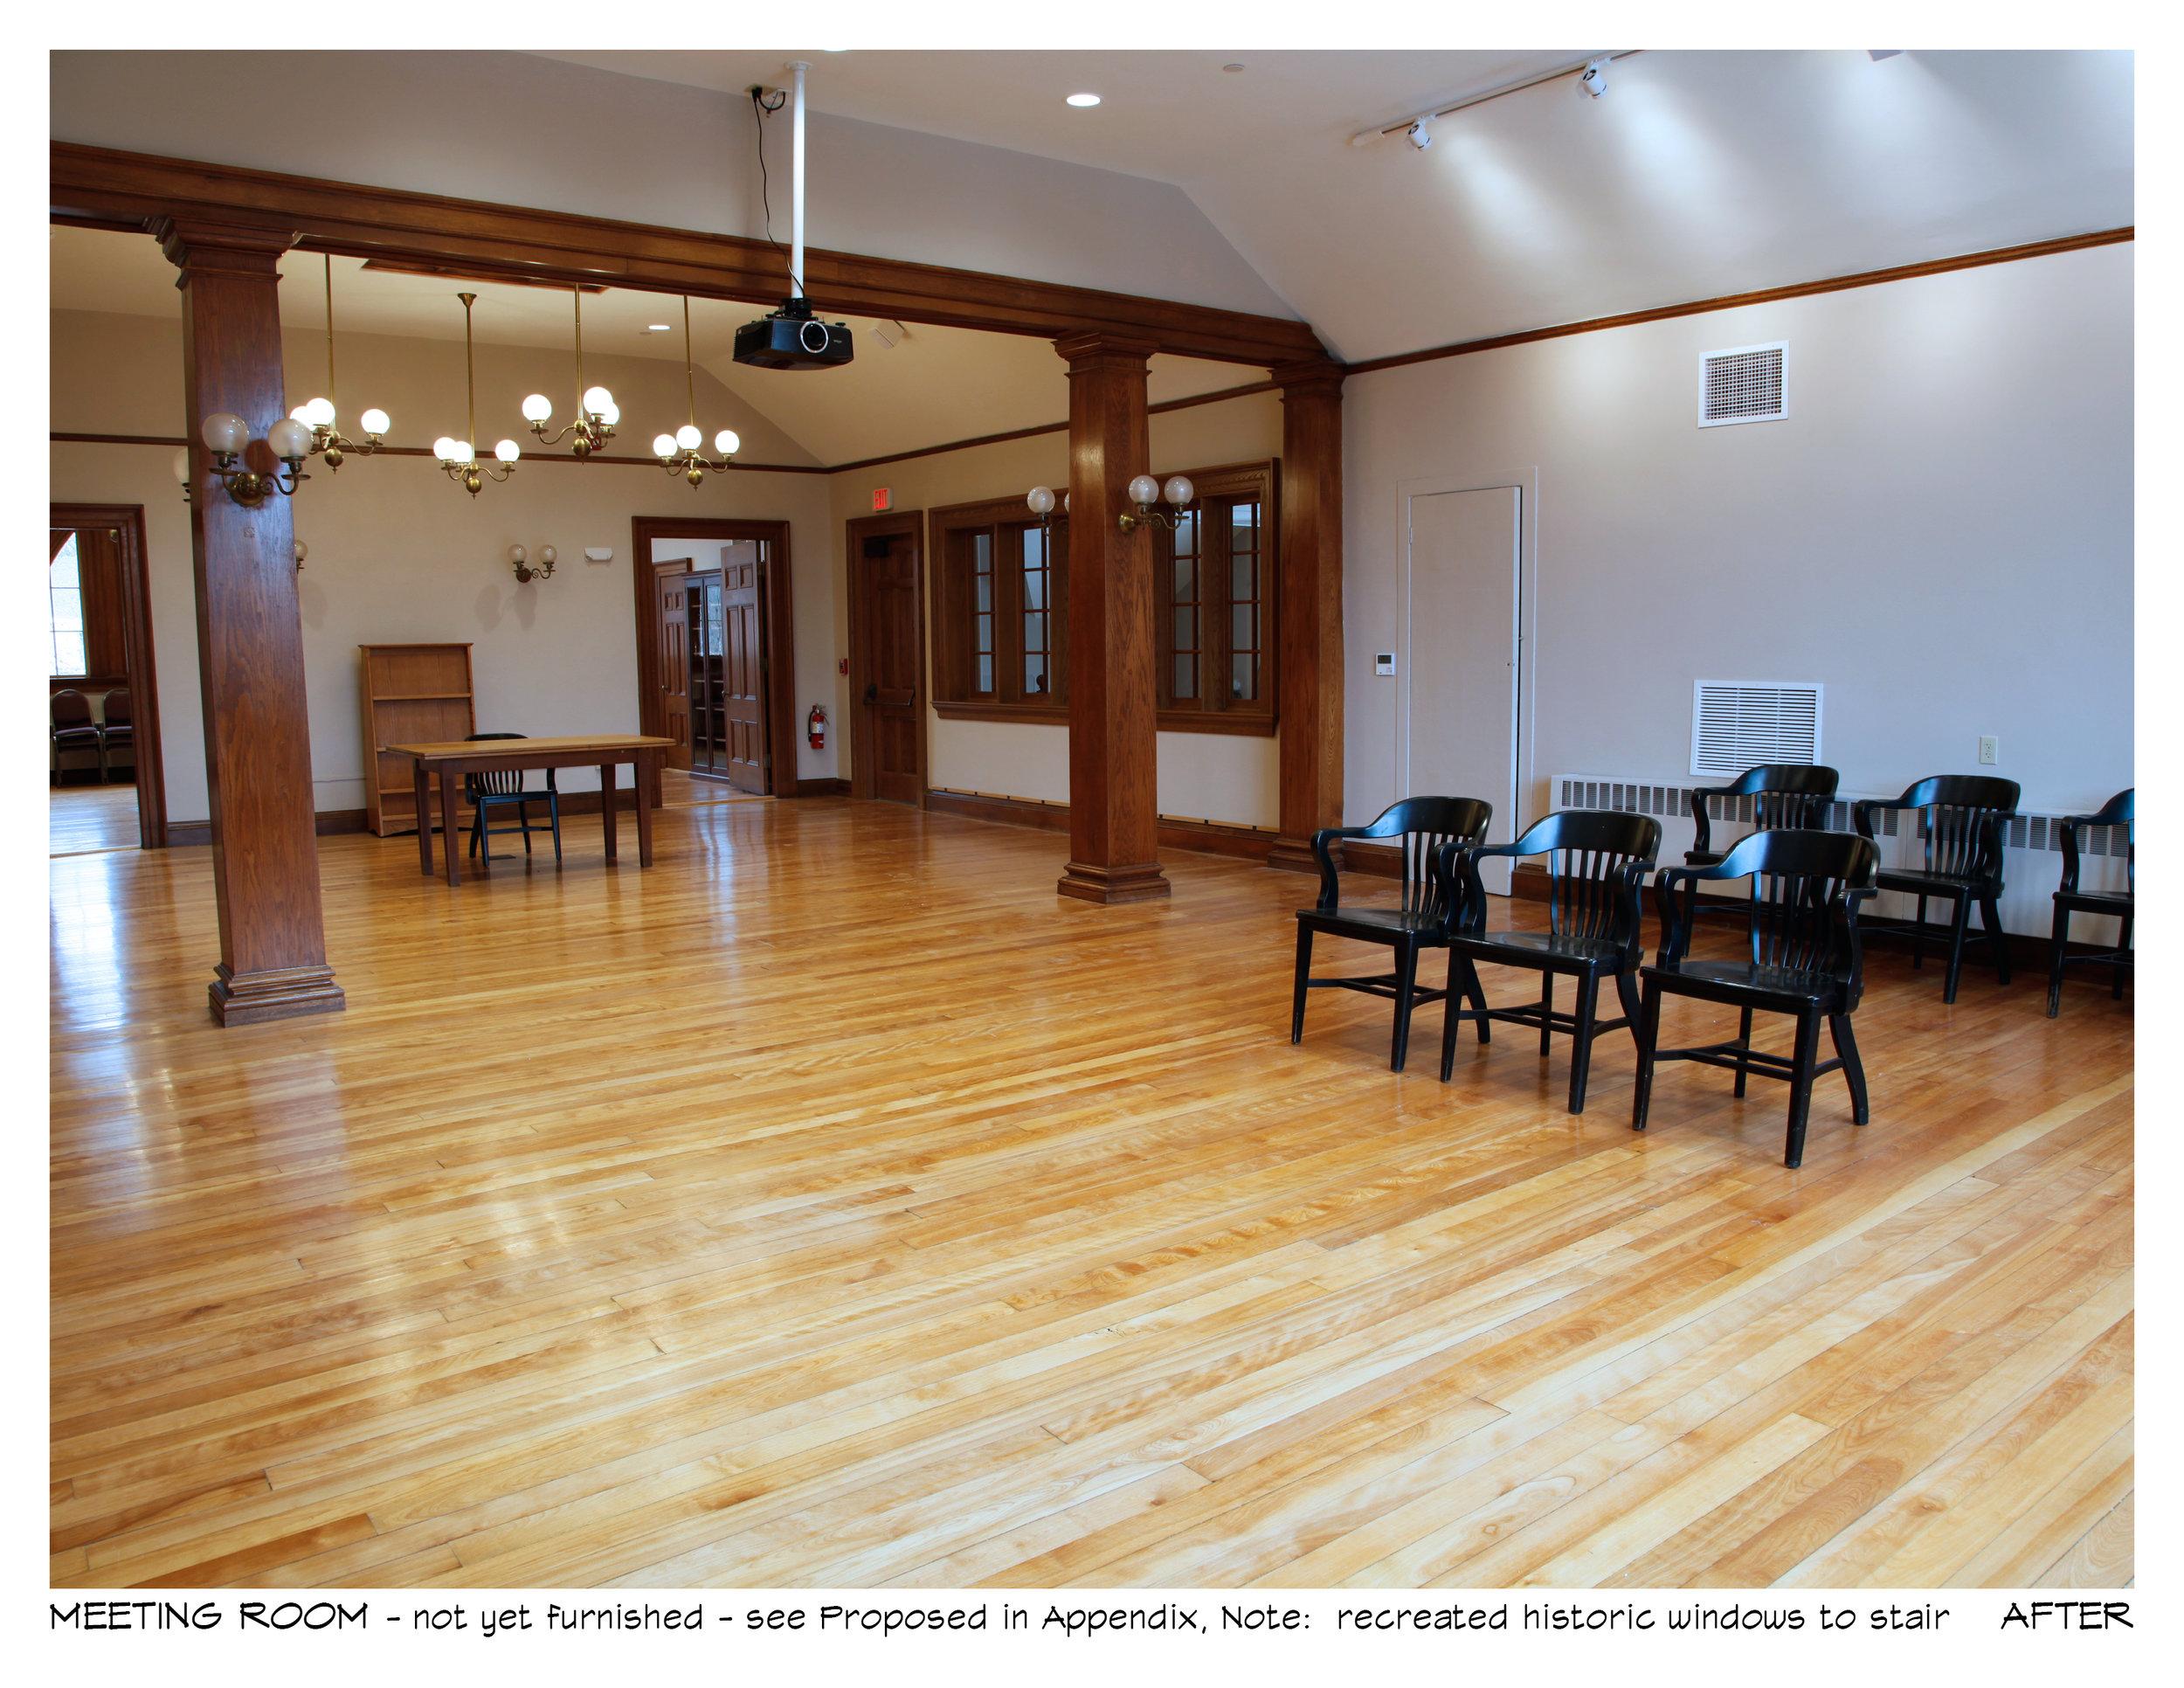 Merrill Lib_11_Meeting Room After_2016_0722.jpg